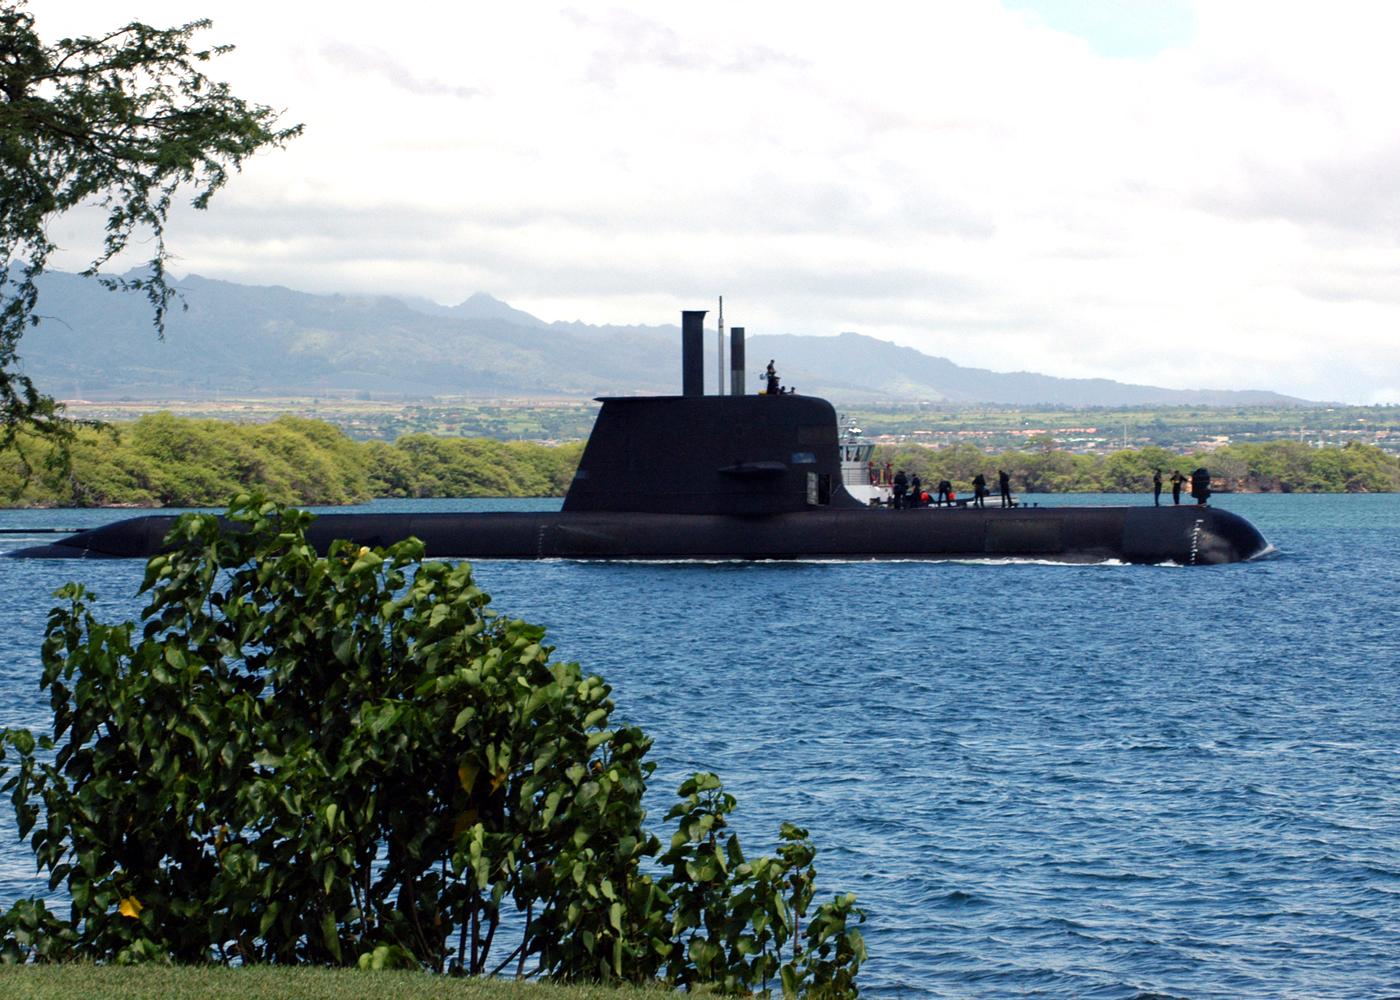 US_Navy_040823-N-3019M-003_The_Australia